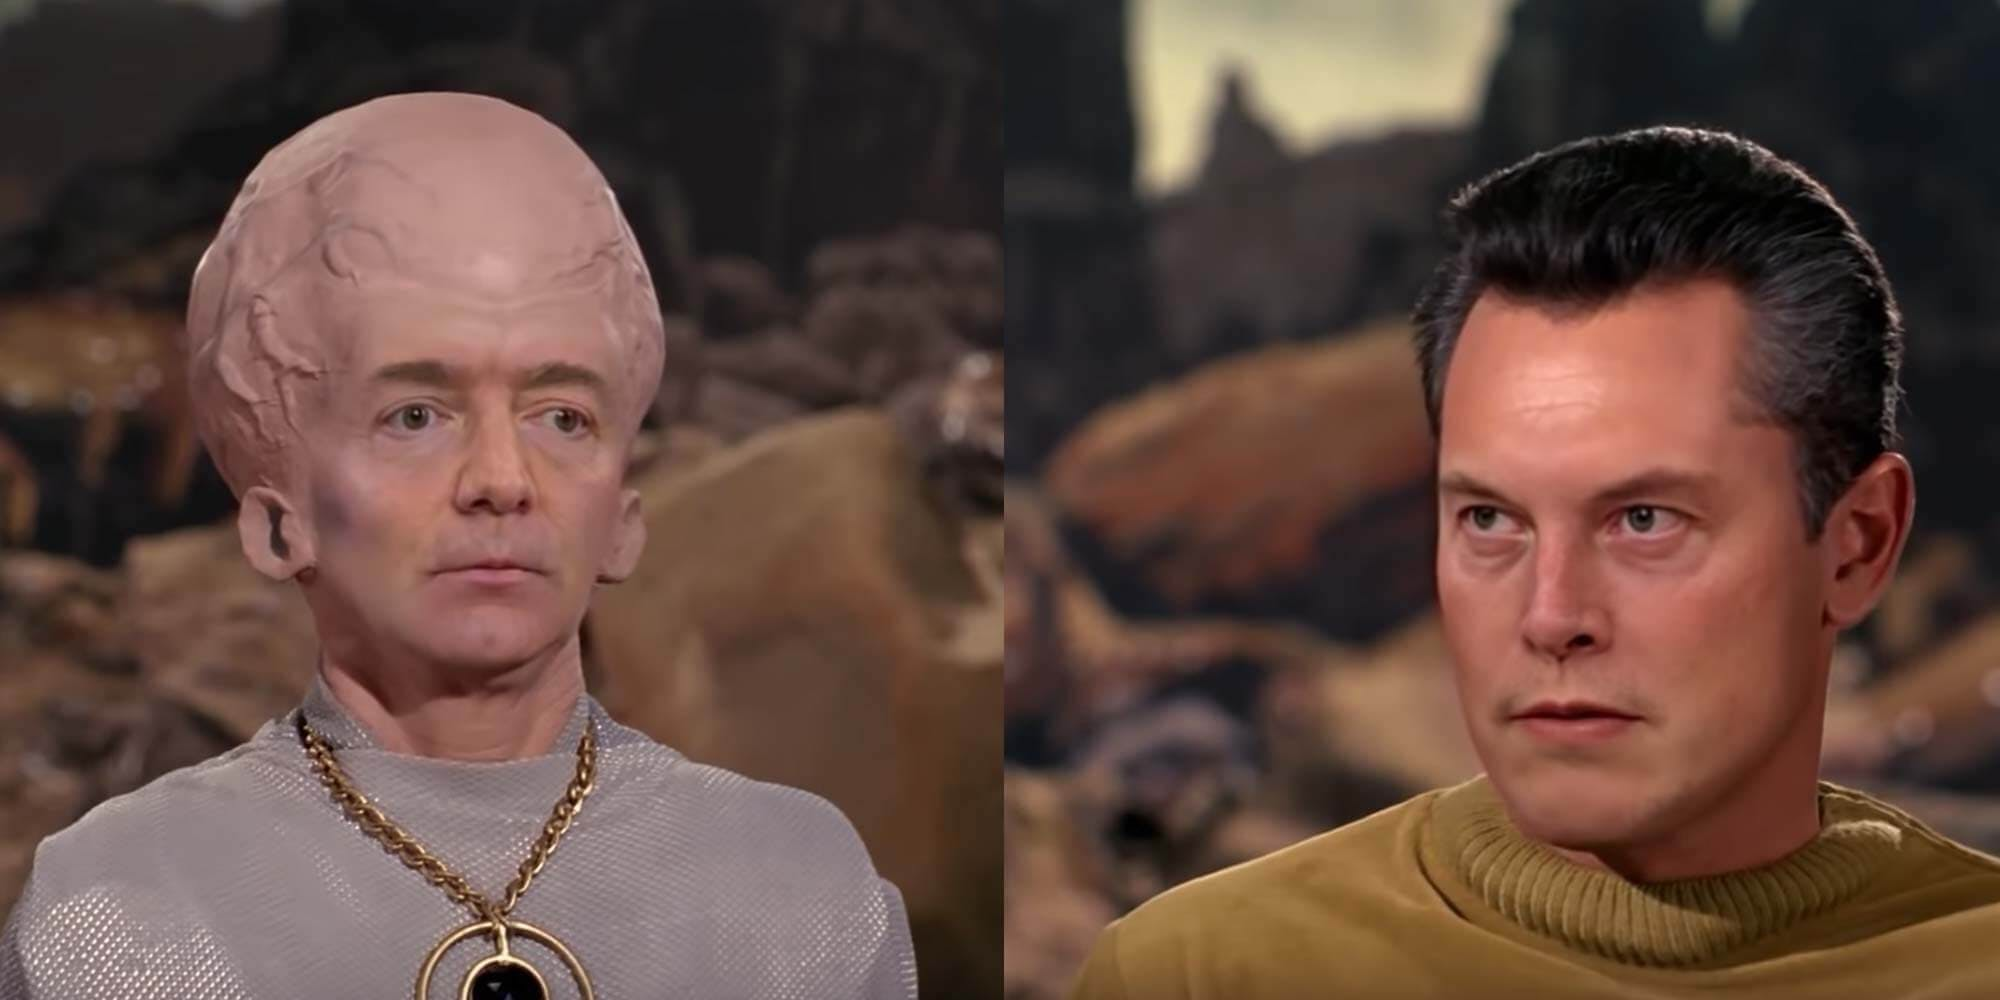 Jeff Bezos and Elon Musk Star Trek deepfake